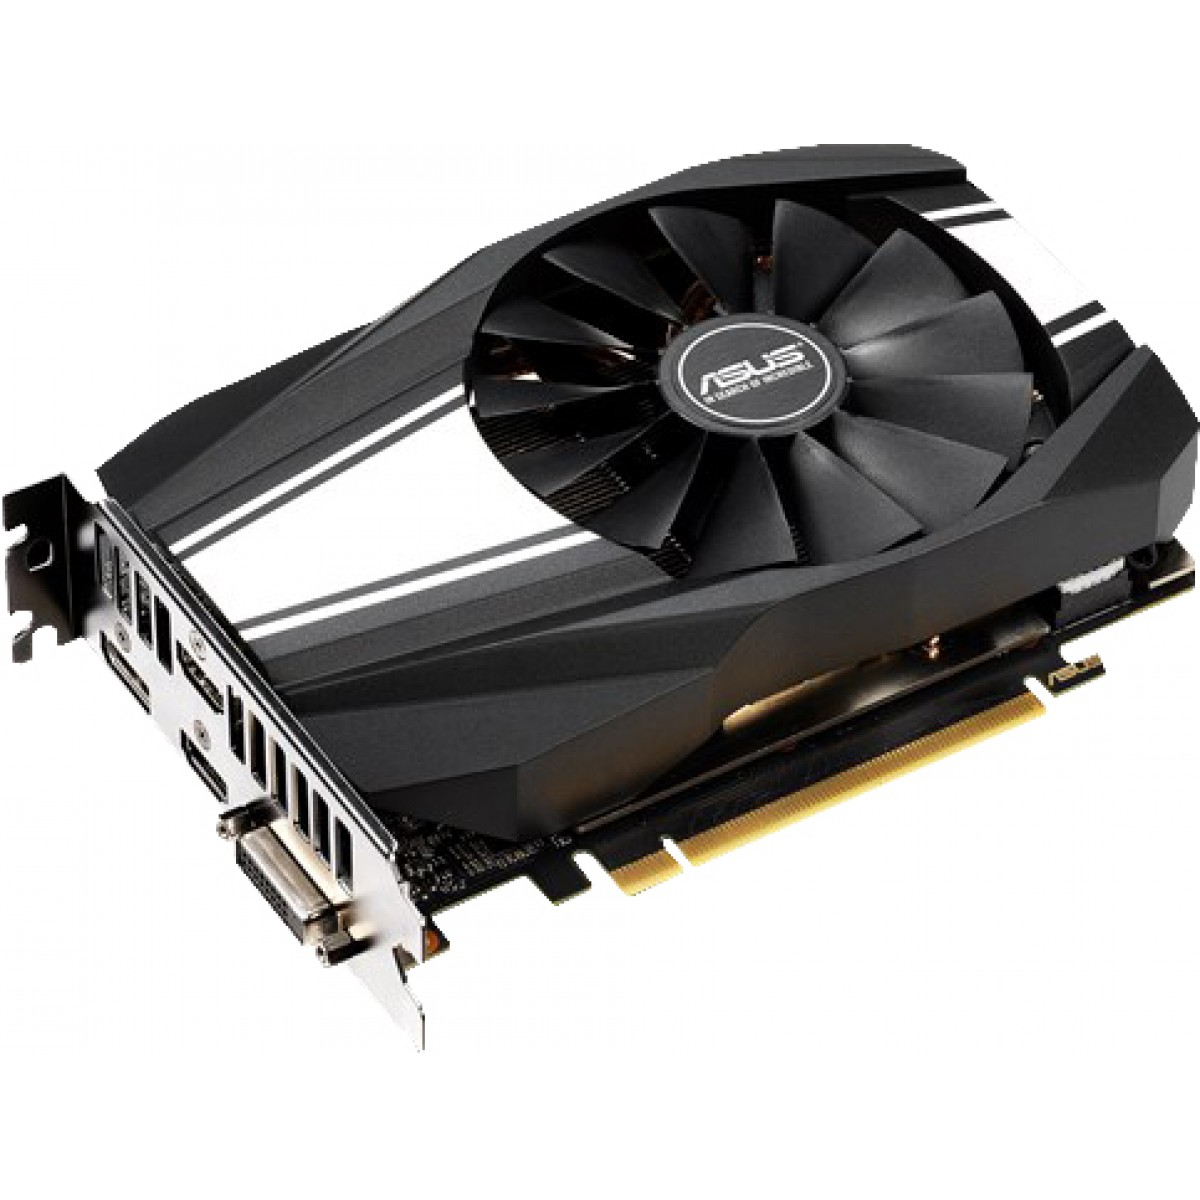 Placa de Vídeo Asus, Geforce, RTX 2060 Phoenix, 6GB, GDDR6, 192Bit, PH-RTX2060-6G